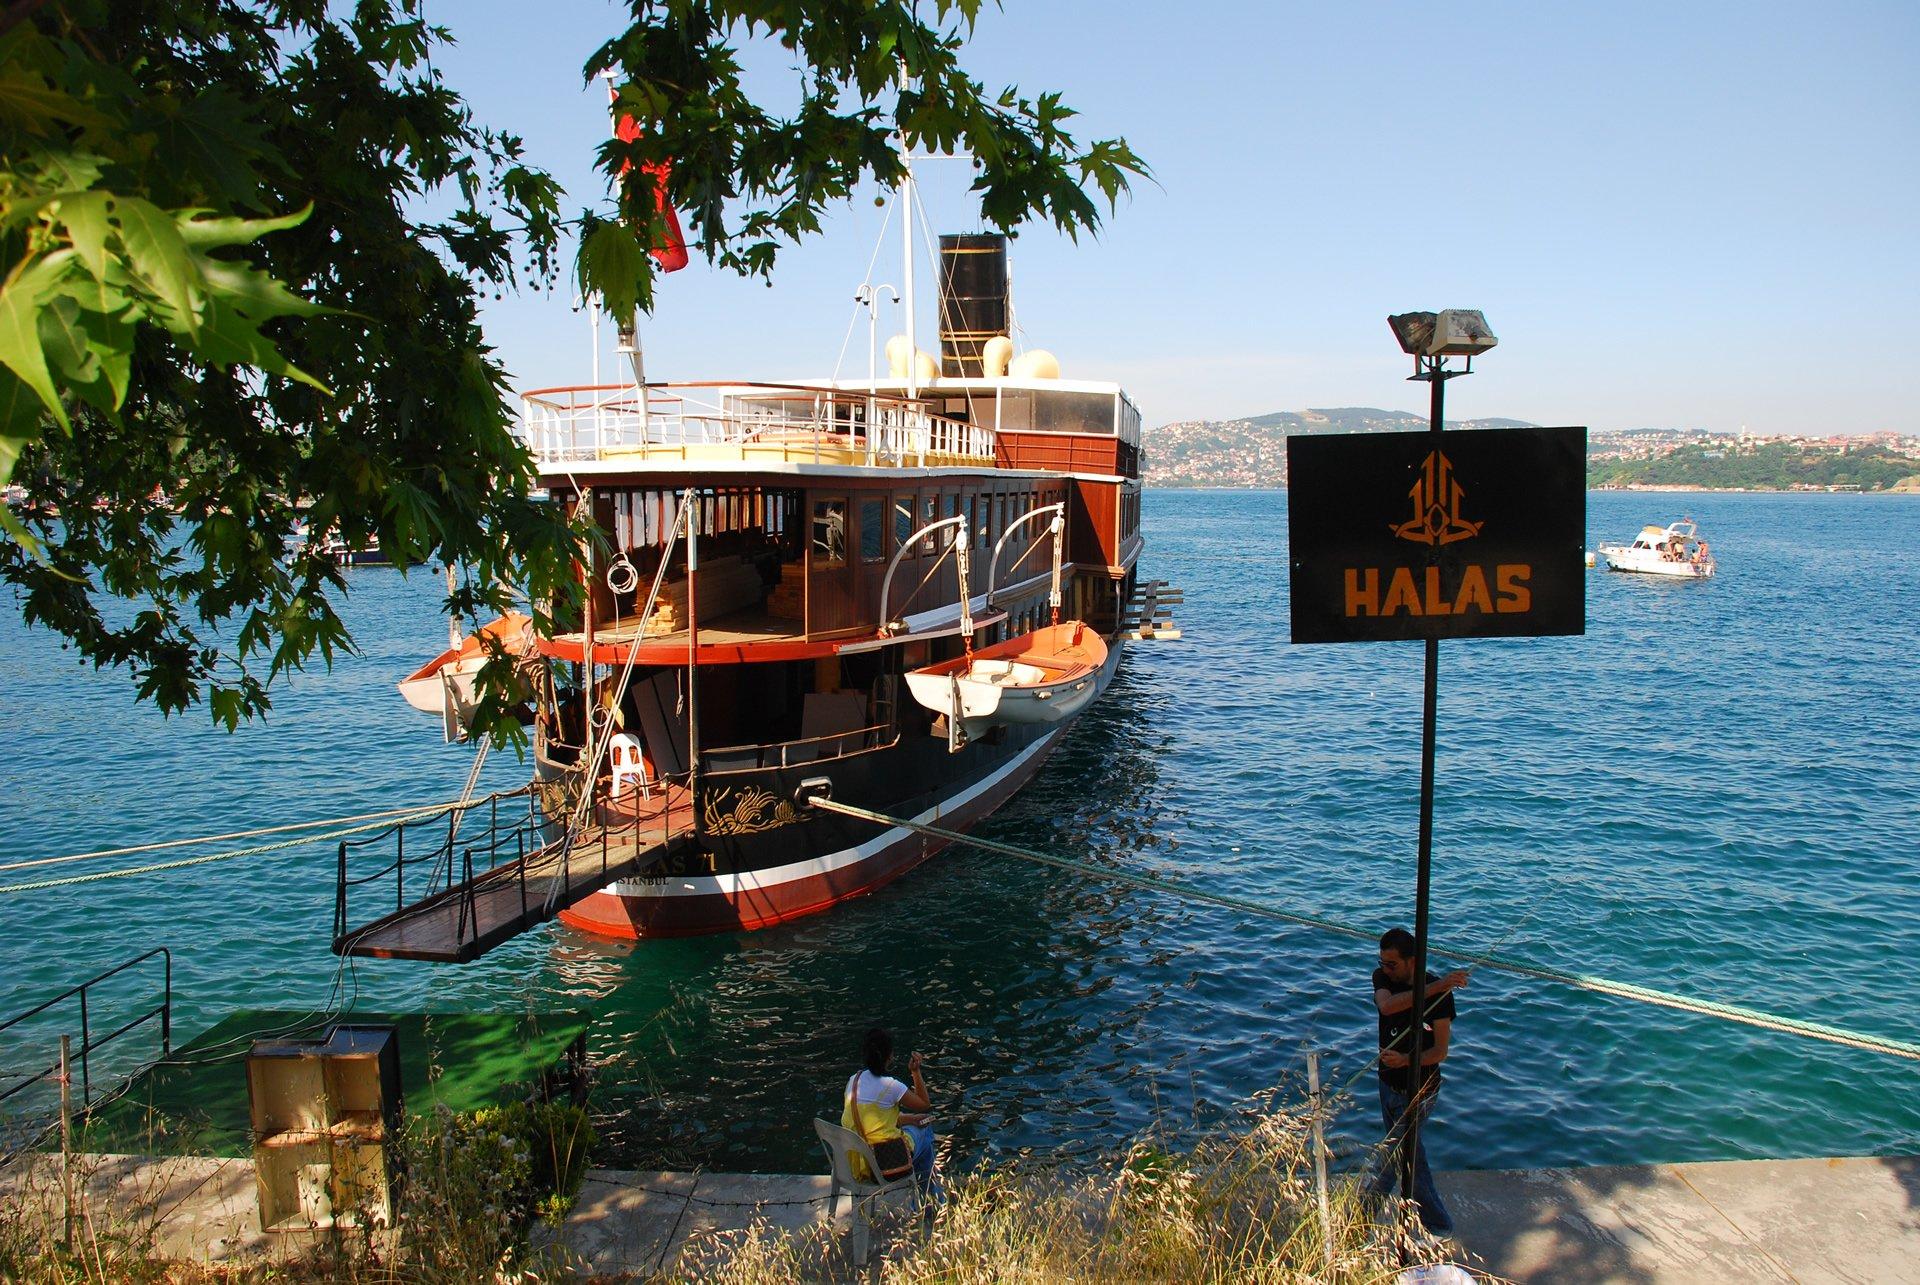 istanbul manzaraları – 9